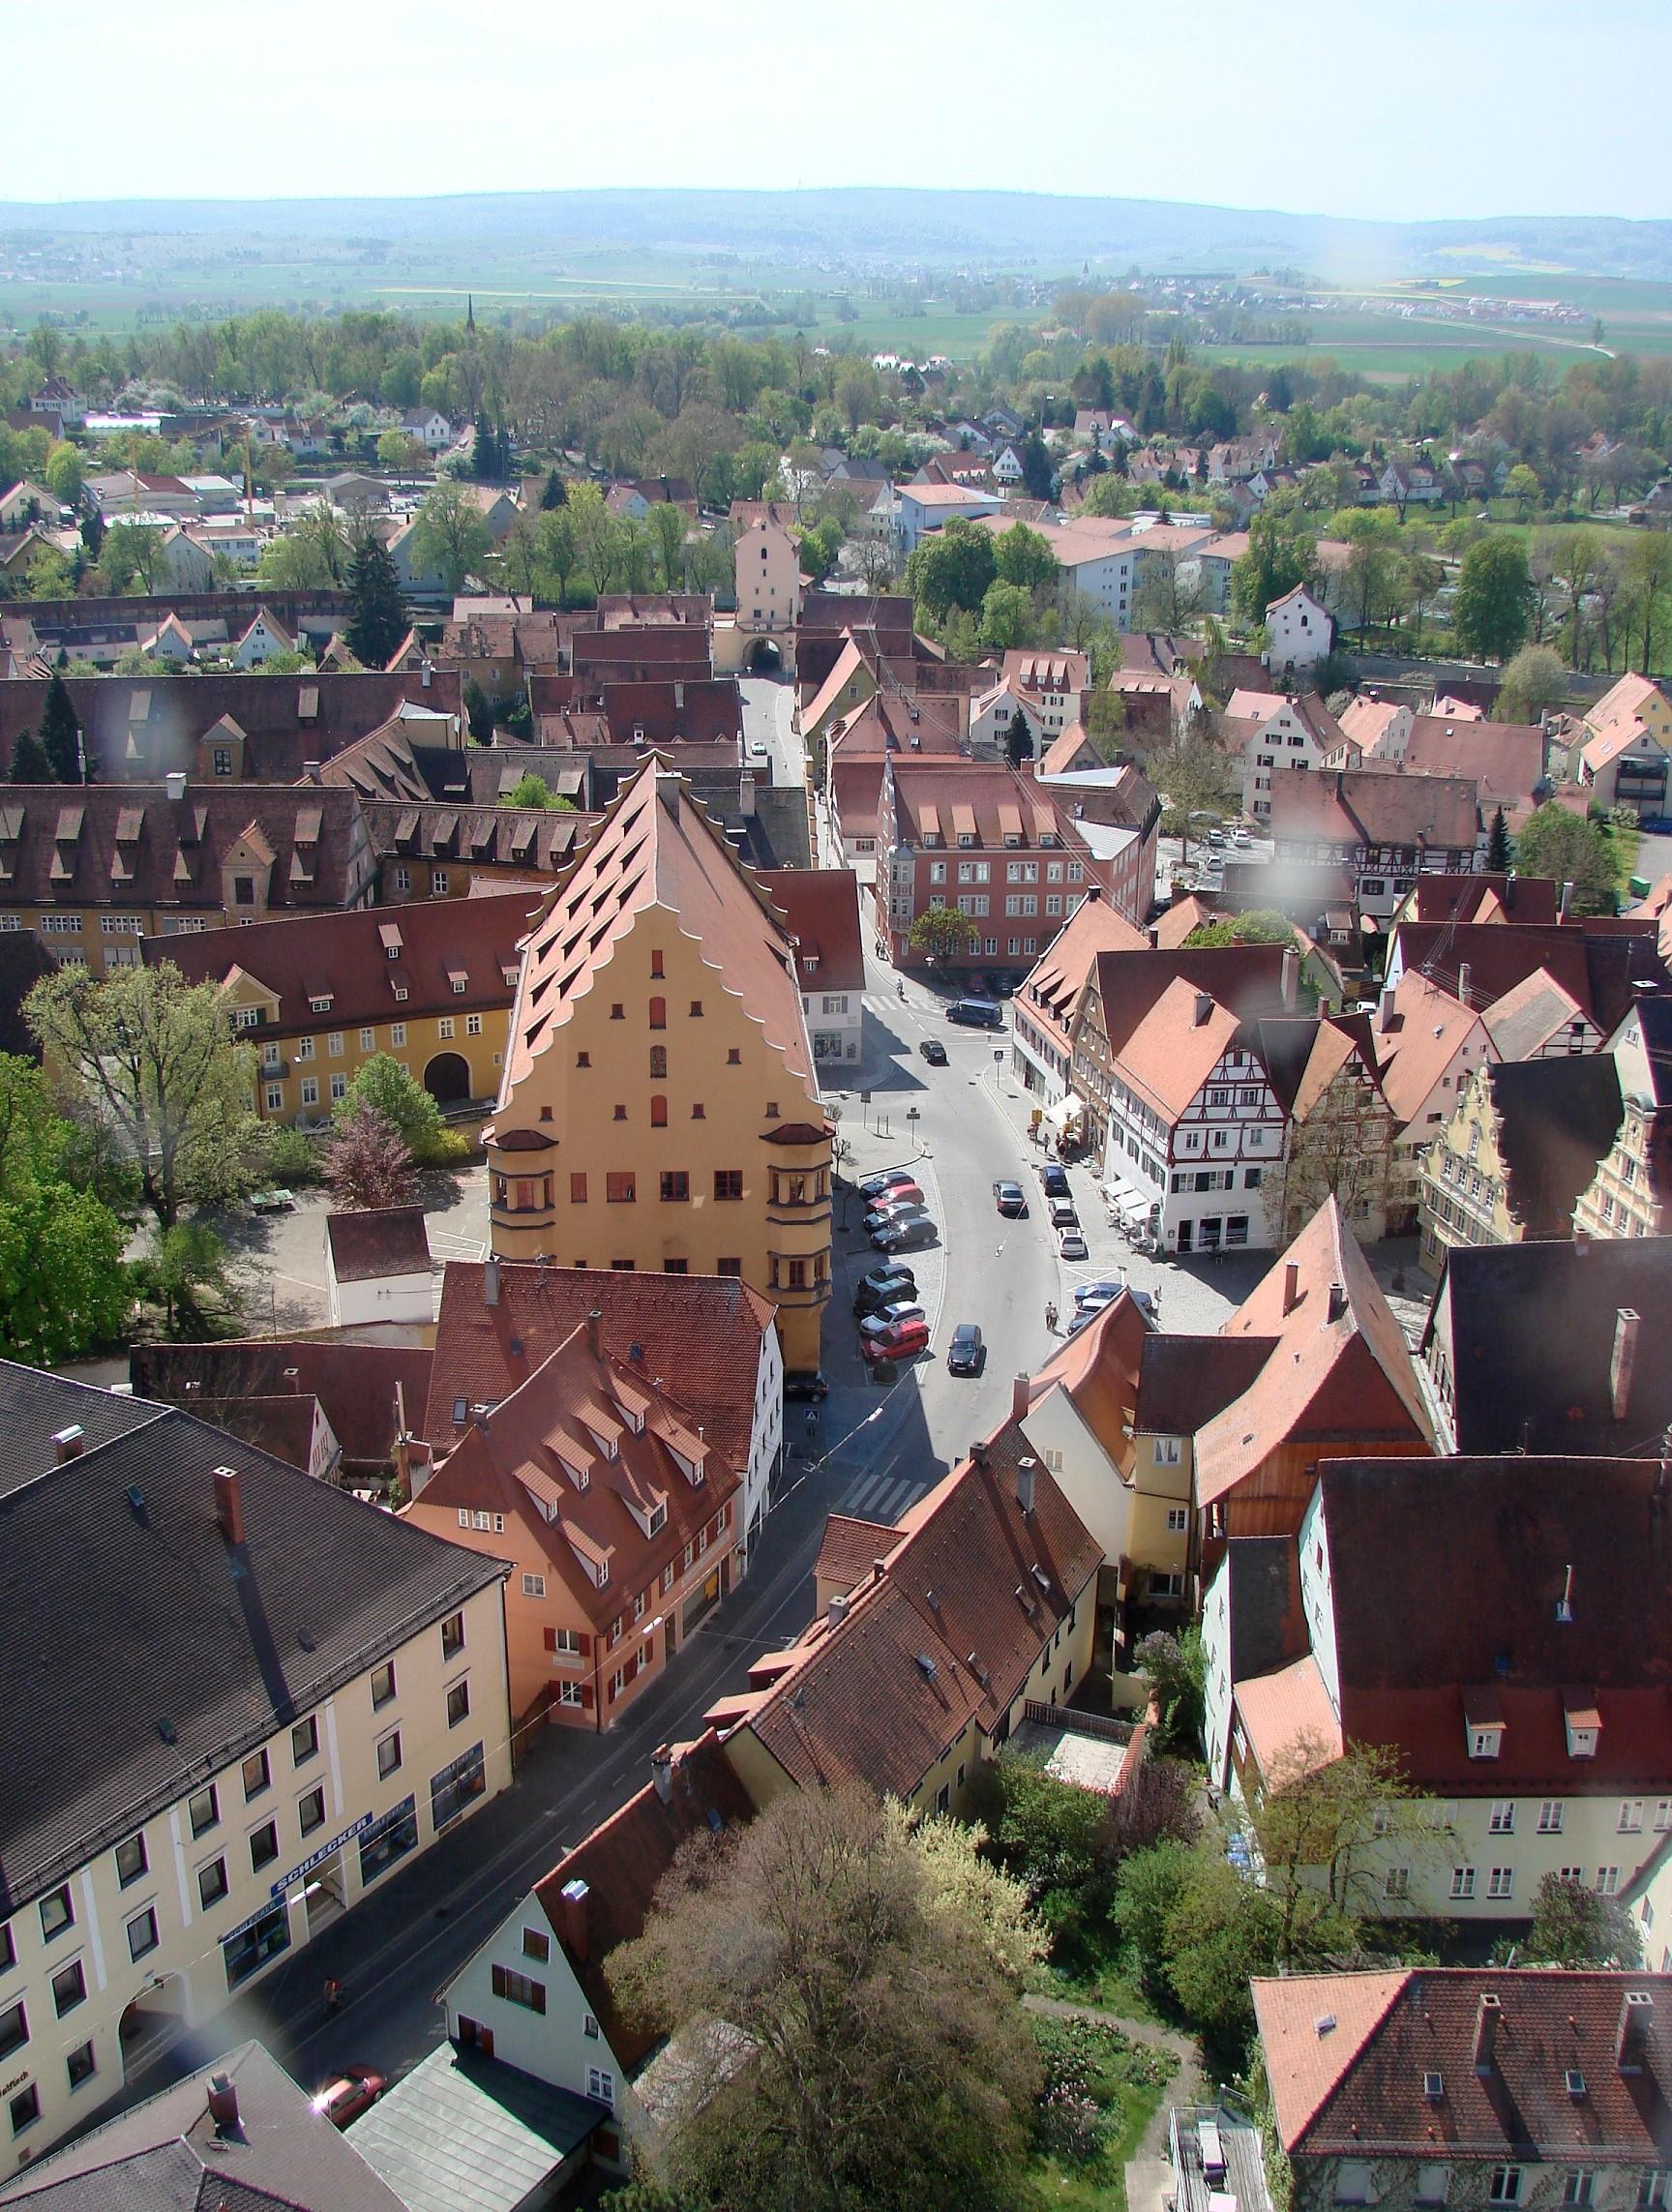 Schlampe aus Rothenfels